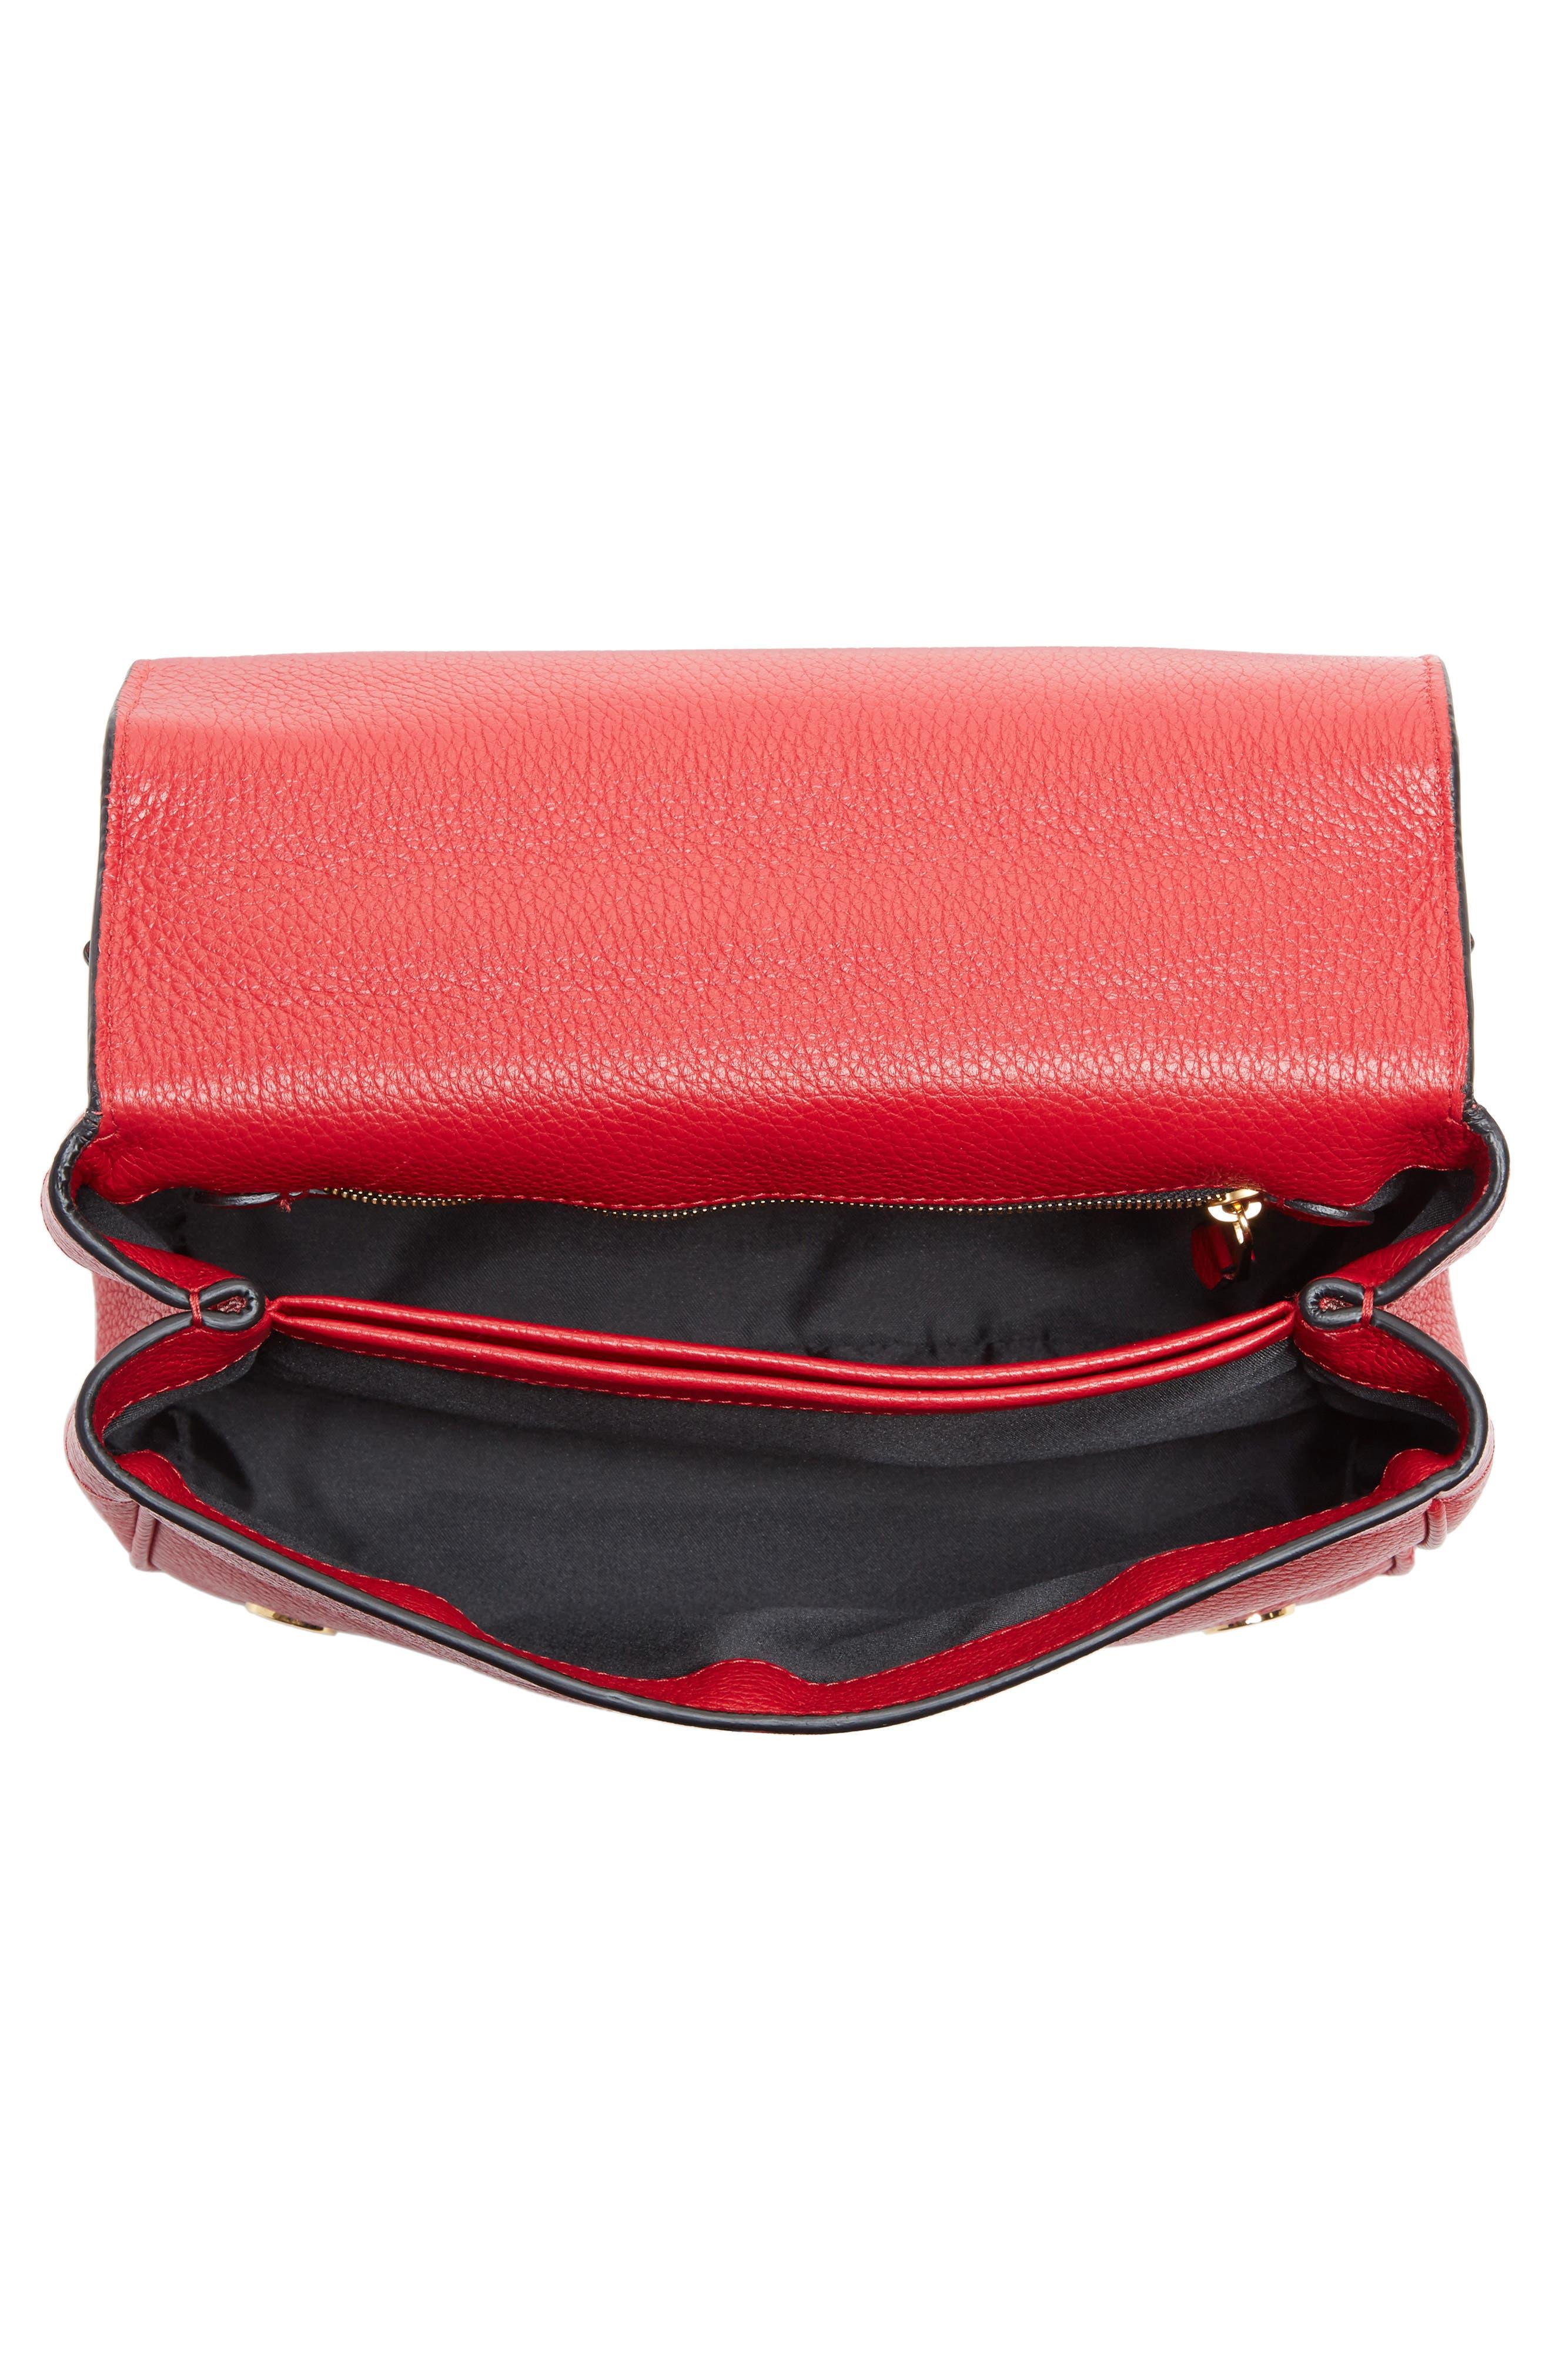 Grainy-B Leather Crossbody Bag,                             Alternate thumbnail 8, color,